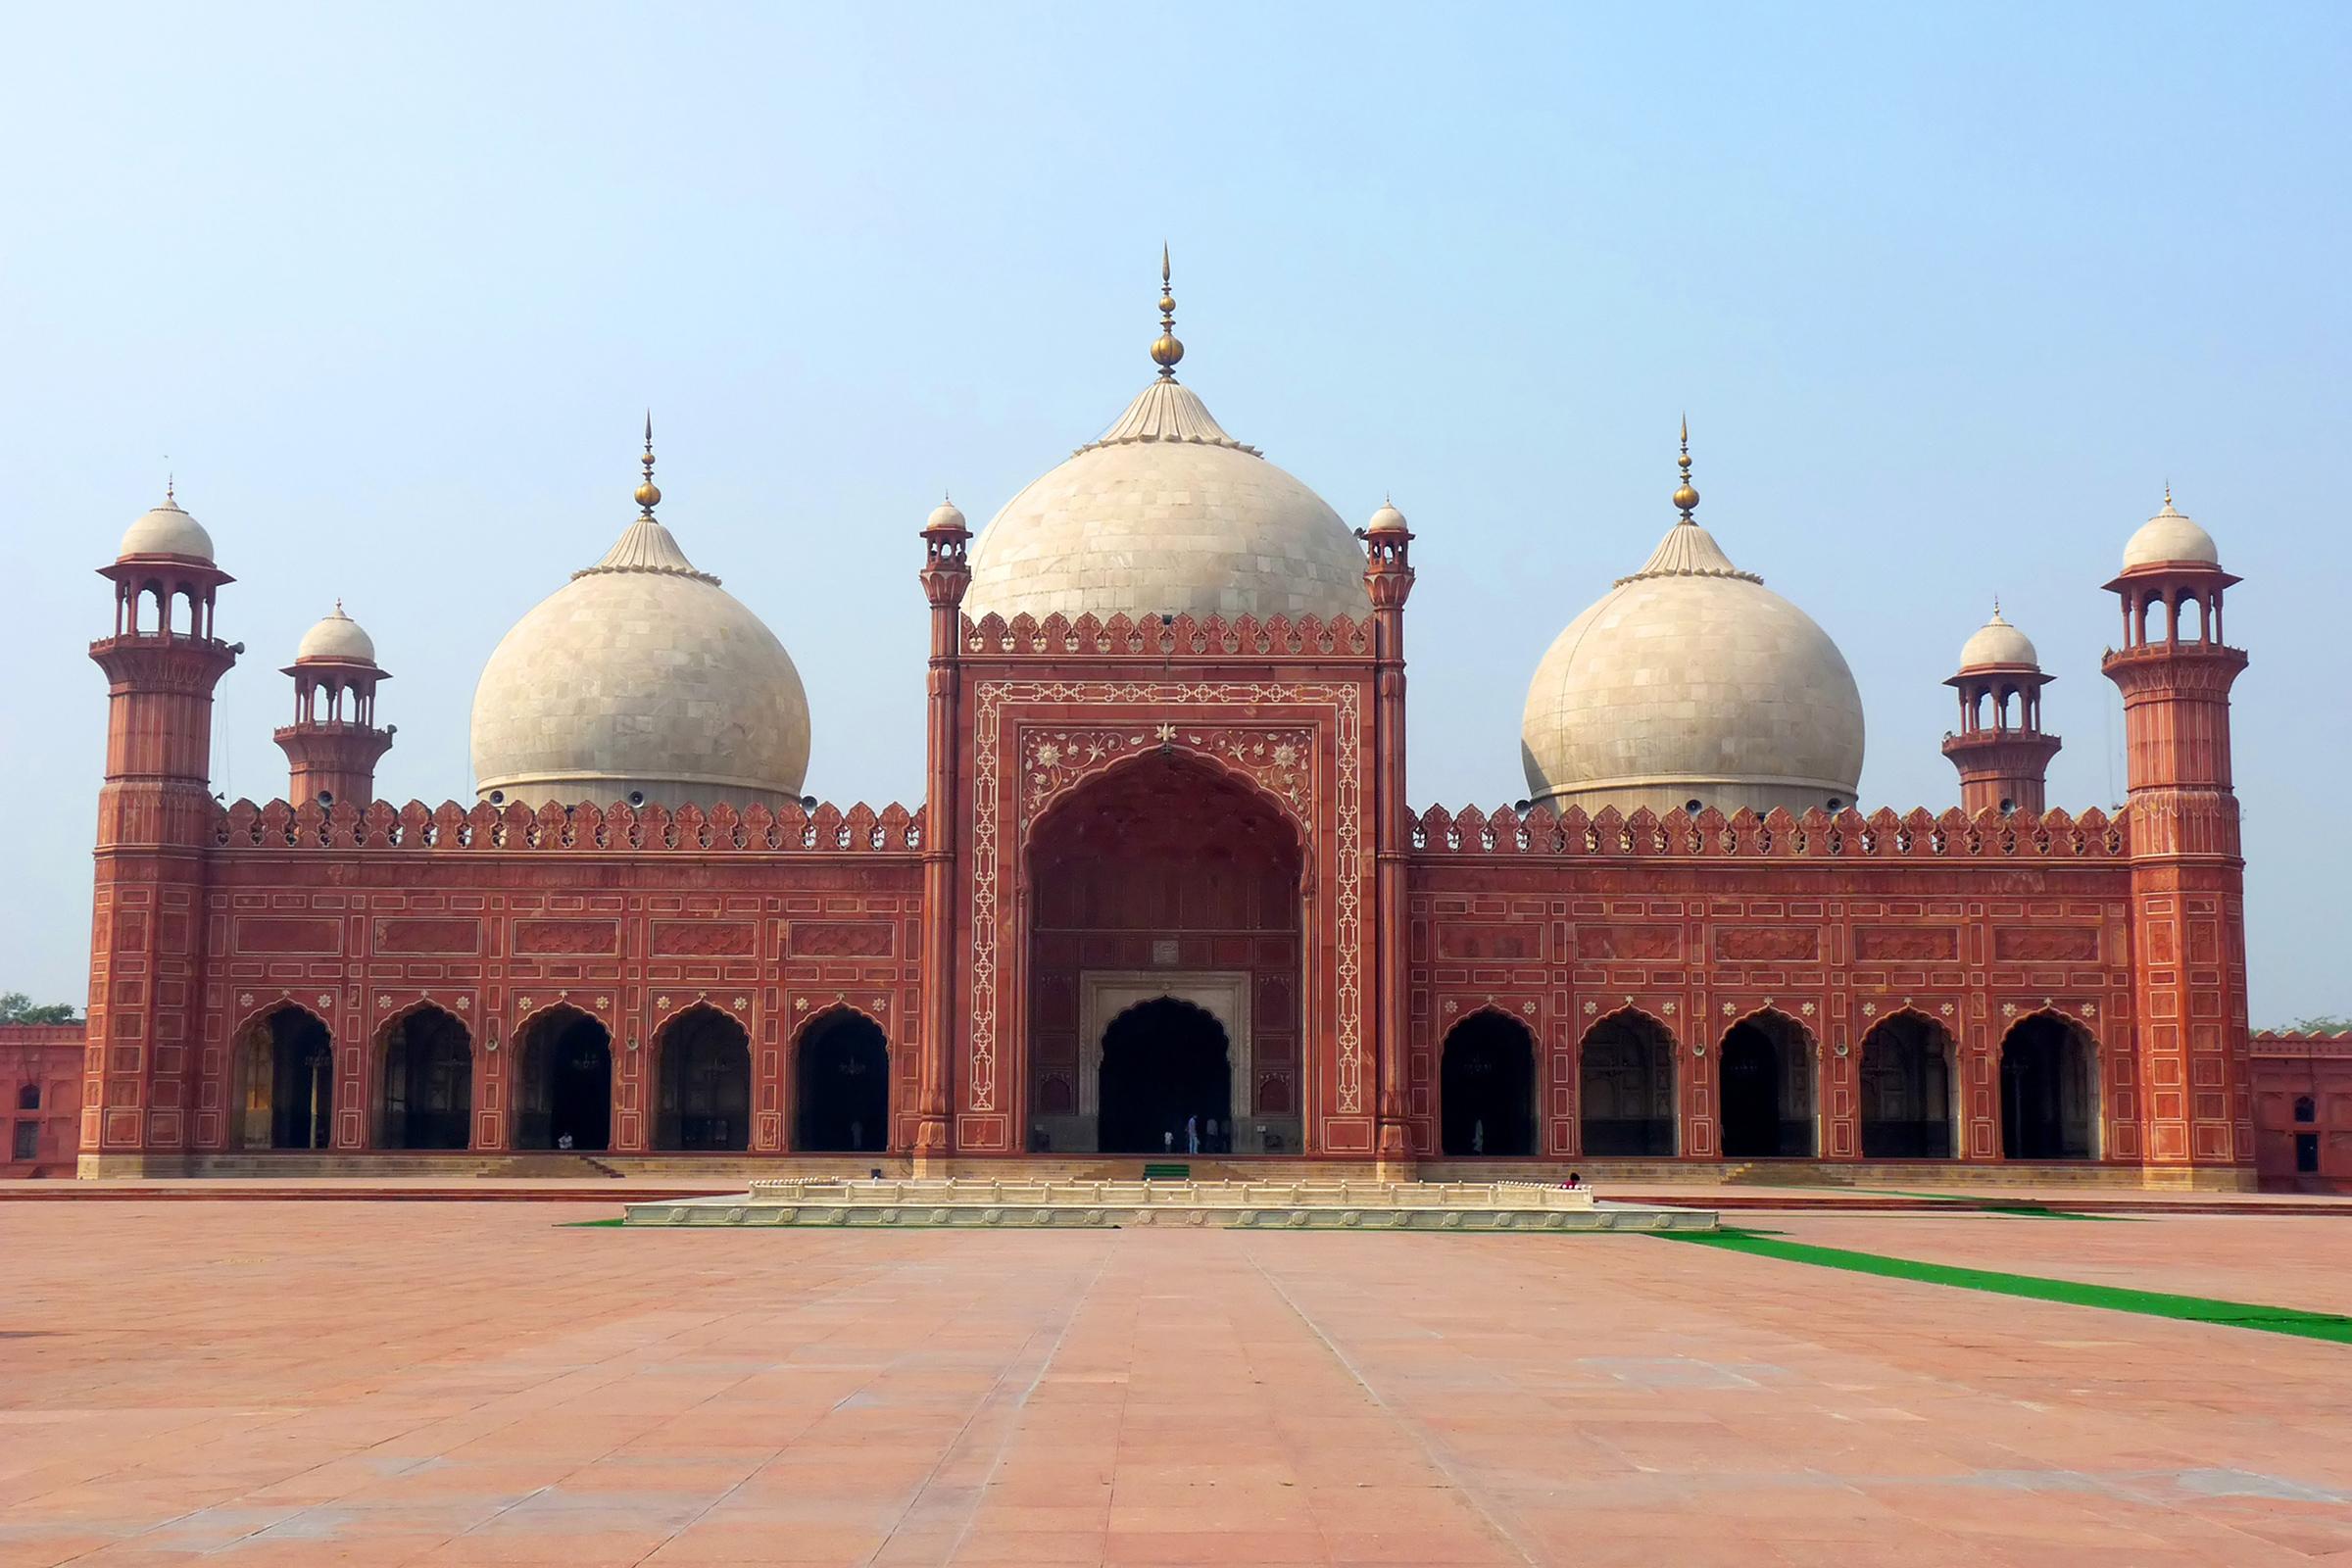 Pakistan Lahore Badshahi Mosque